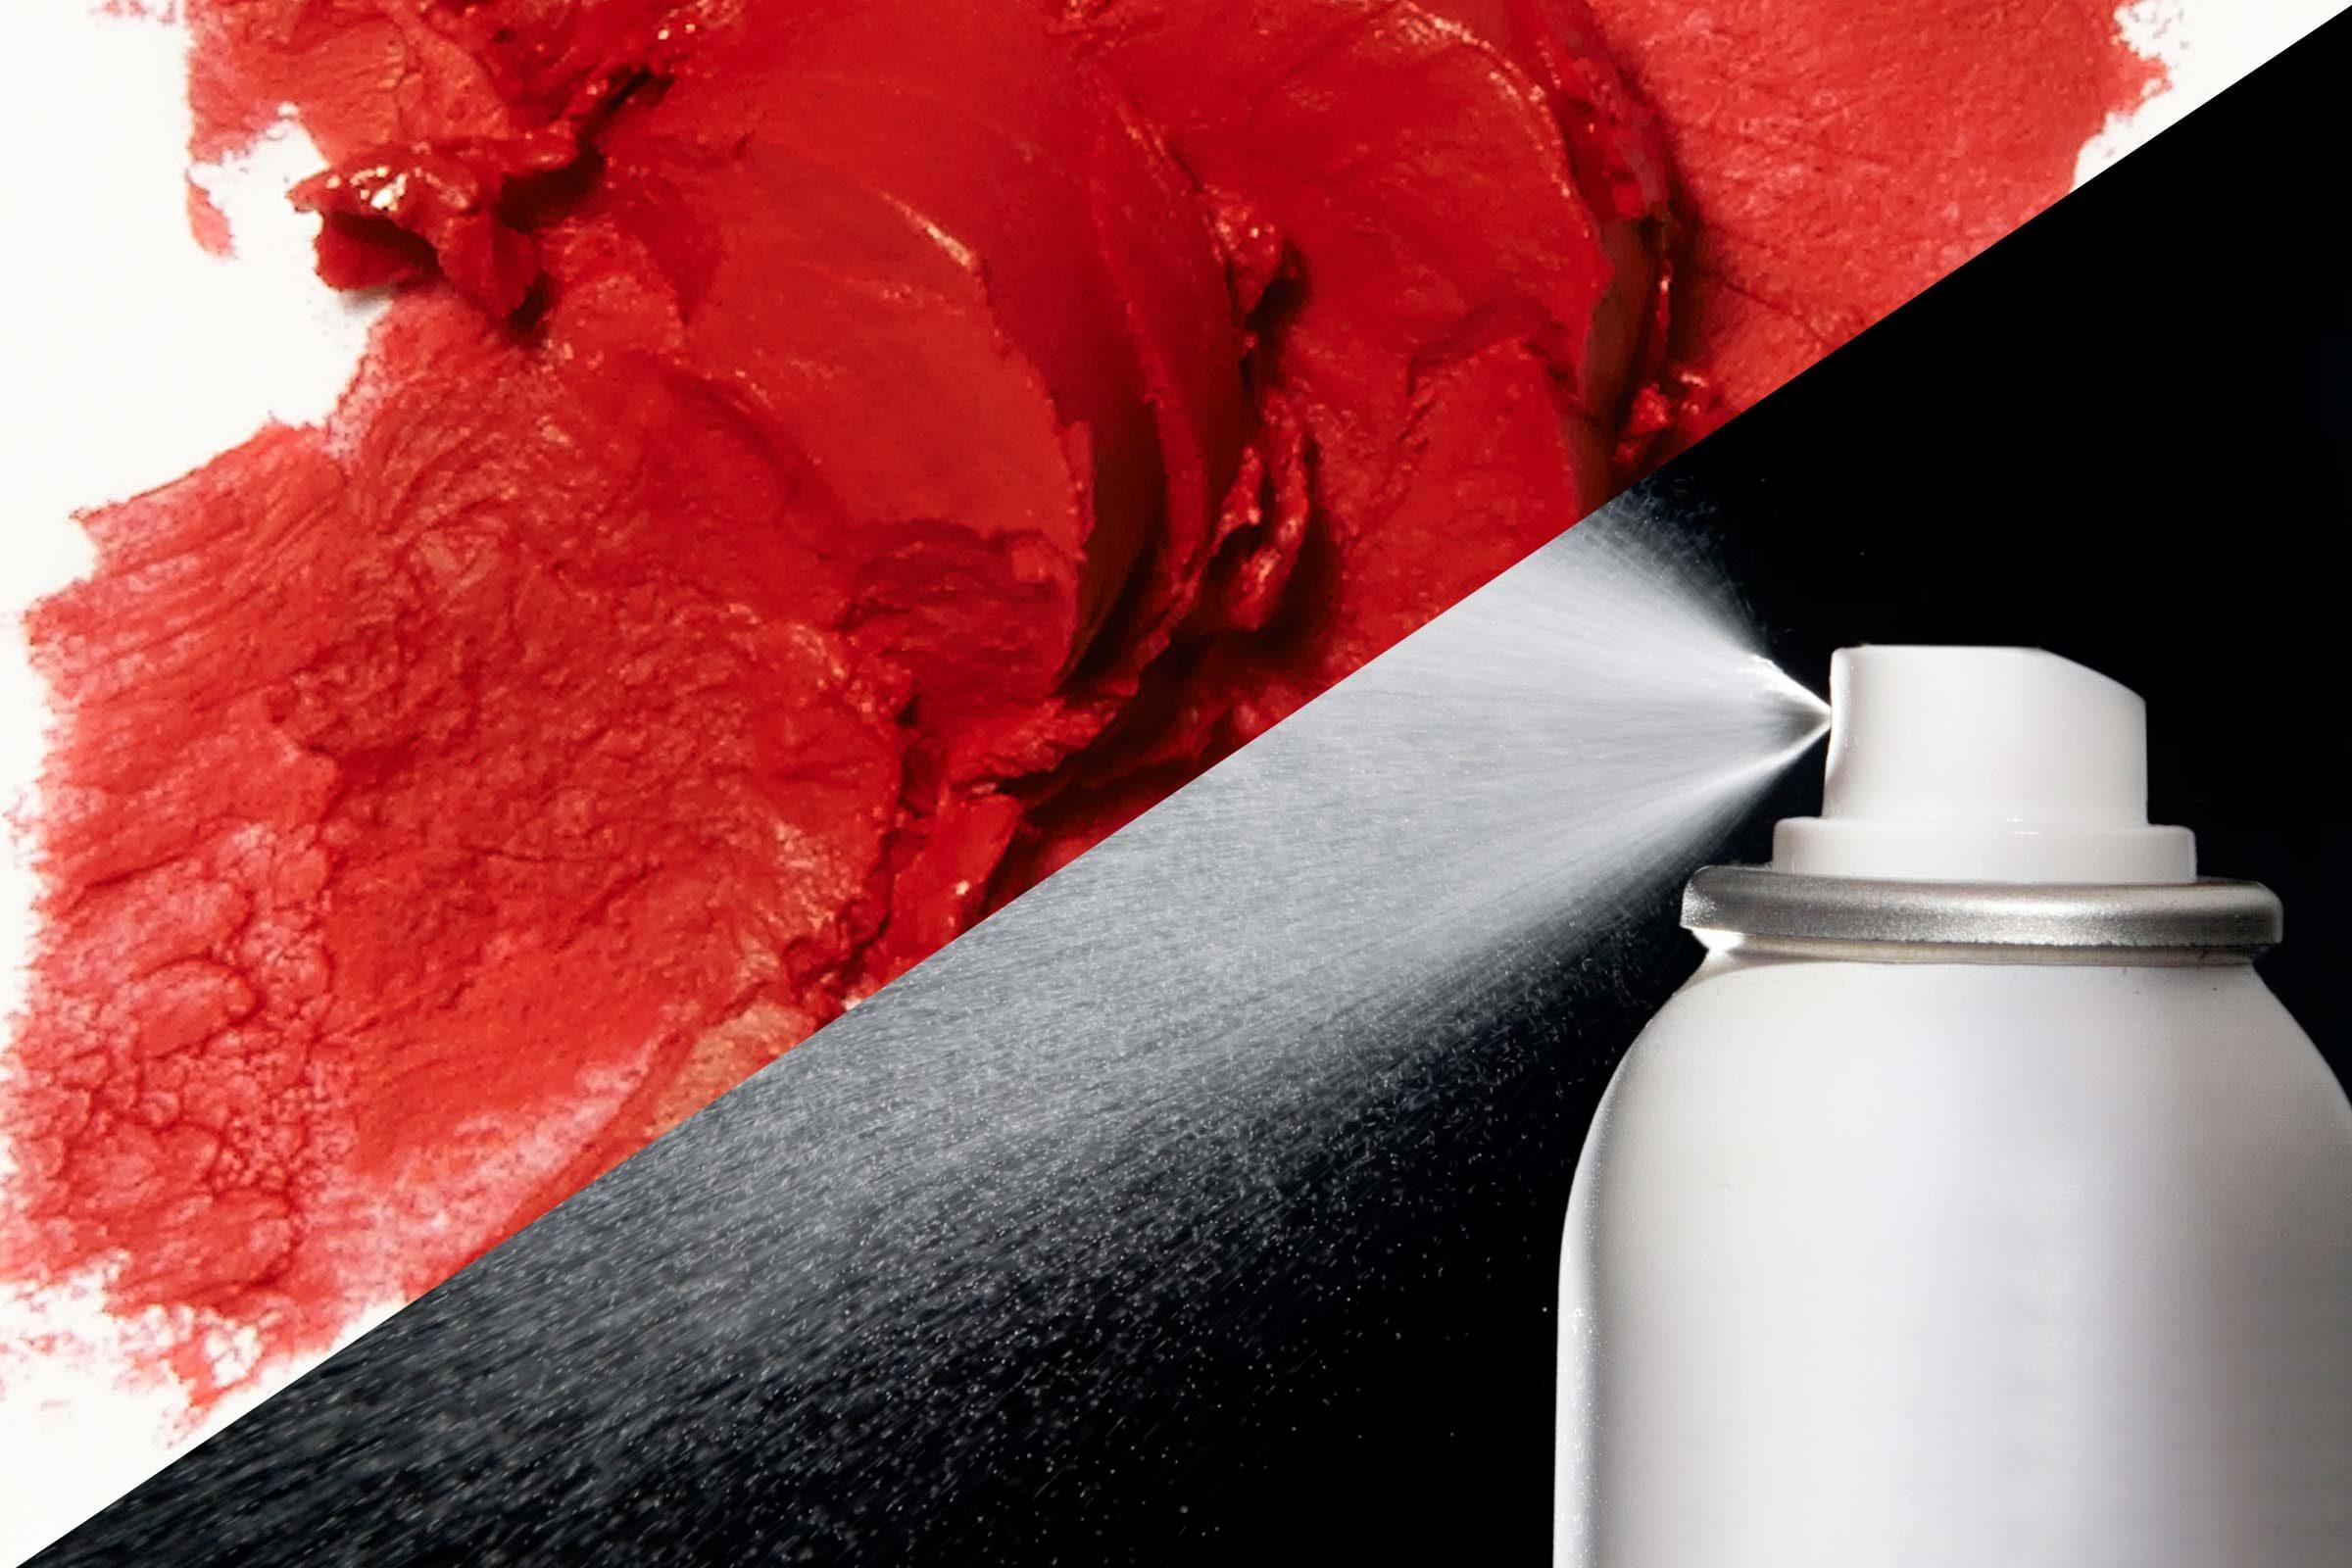 Remove lipstick from fabric